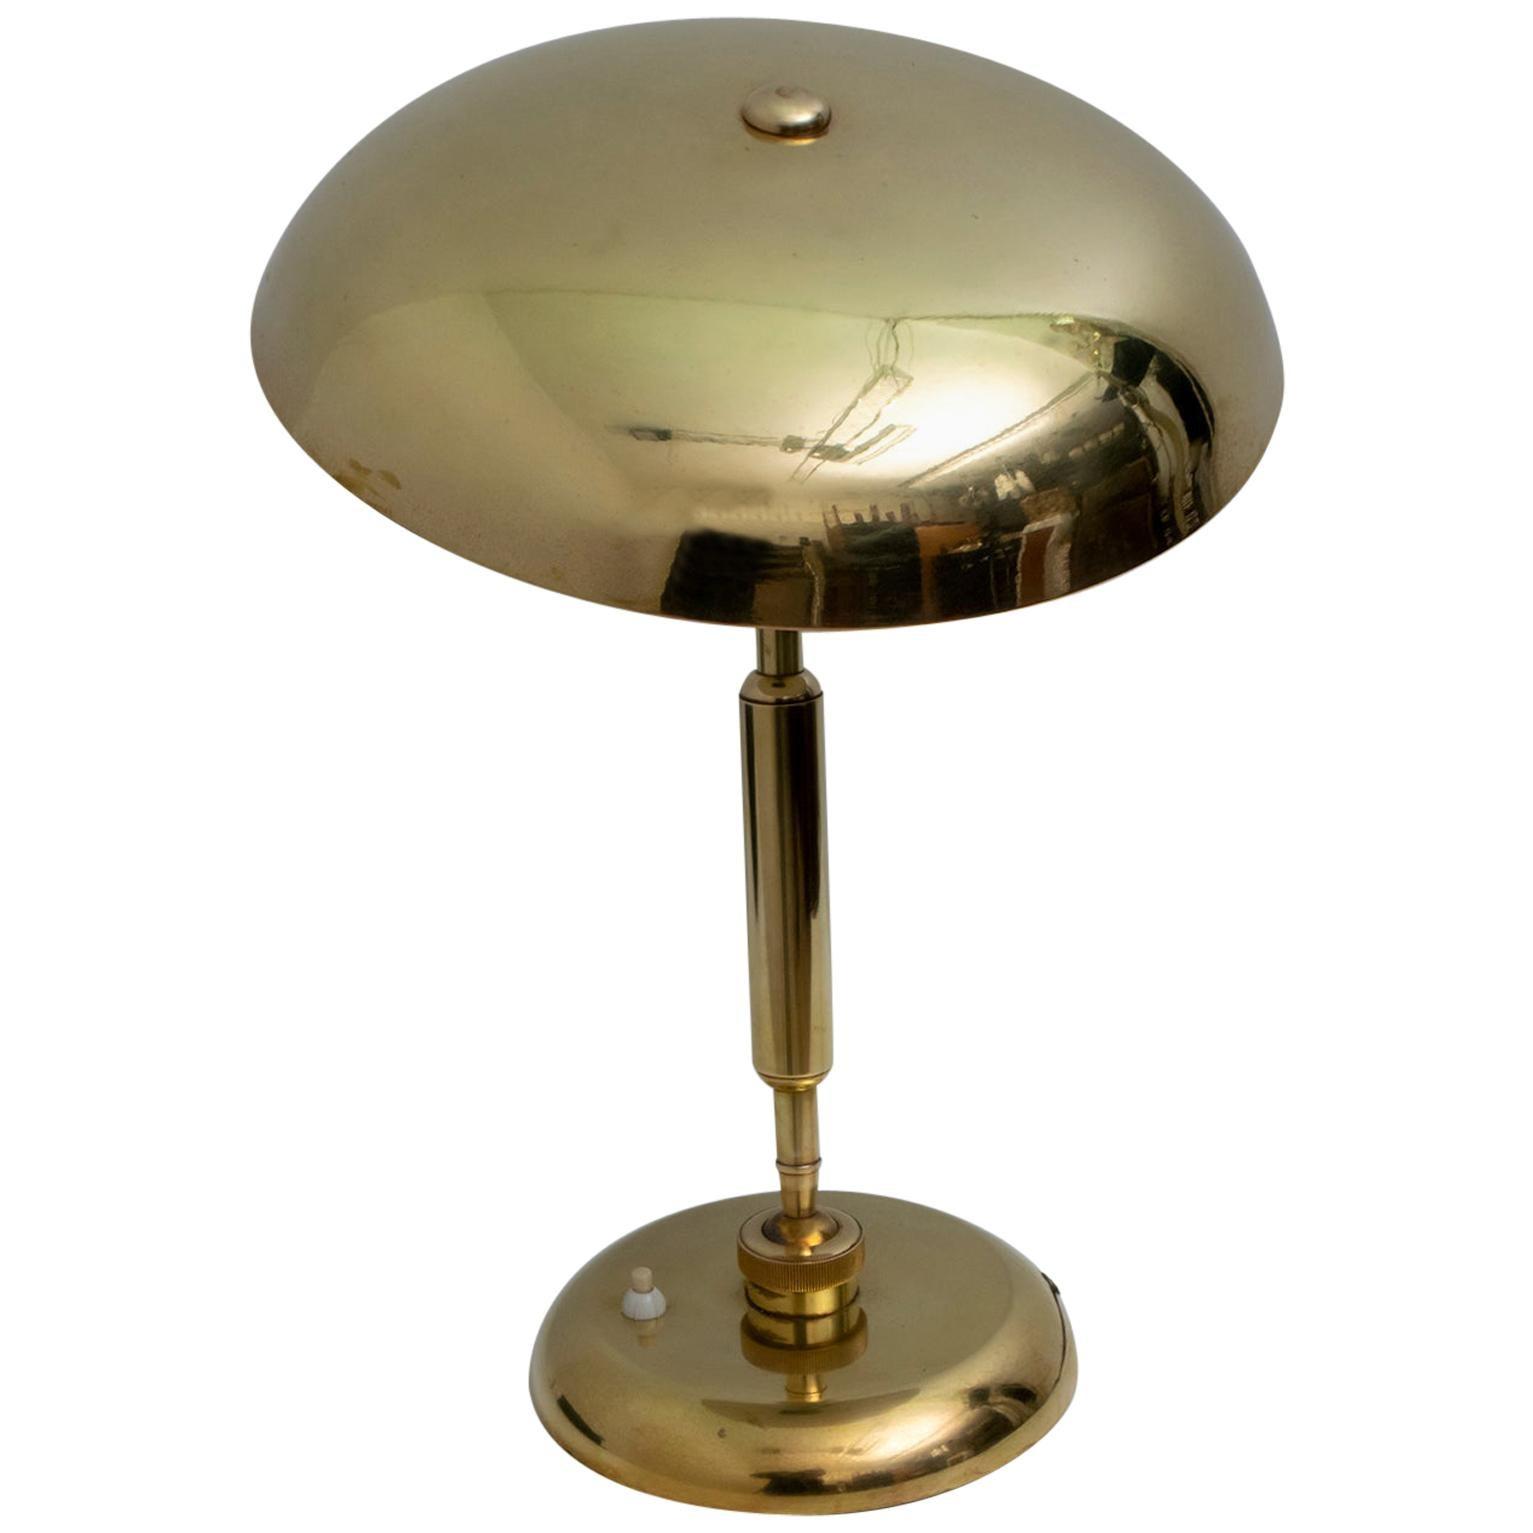 "Giovanni Michelucci Midcentury Italian Adjustable Brass Table Lamp ""Lariolux"""